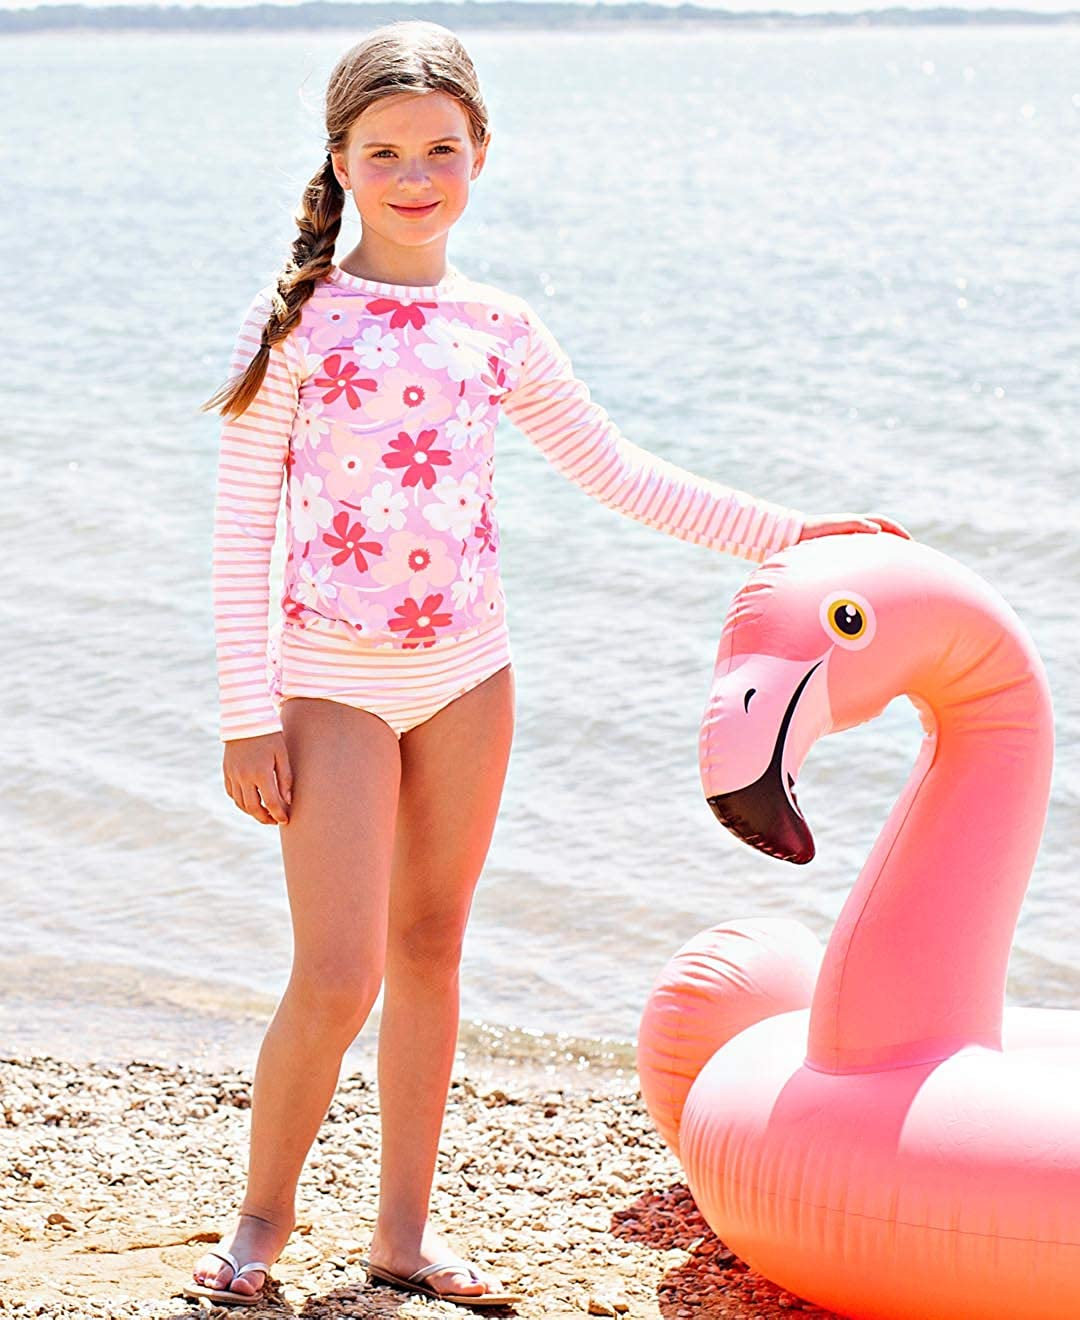 RuffleButts Little Girls Rash Guard 2-Piece Swimsuit Set Long Sleeve Bikini with UPF 50 Sun Protection RGSYYXX-PRLS-SC-TDLR